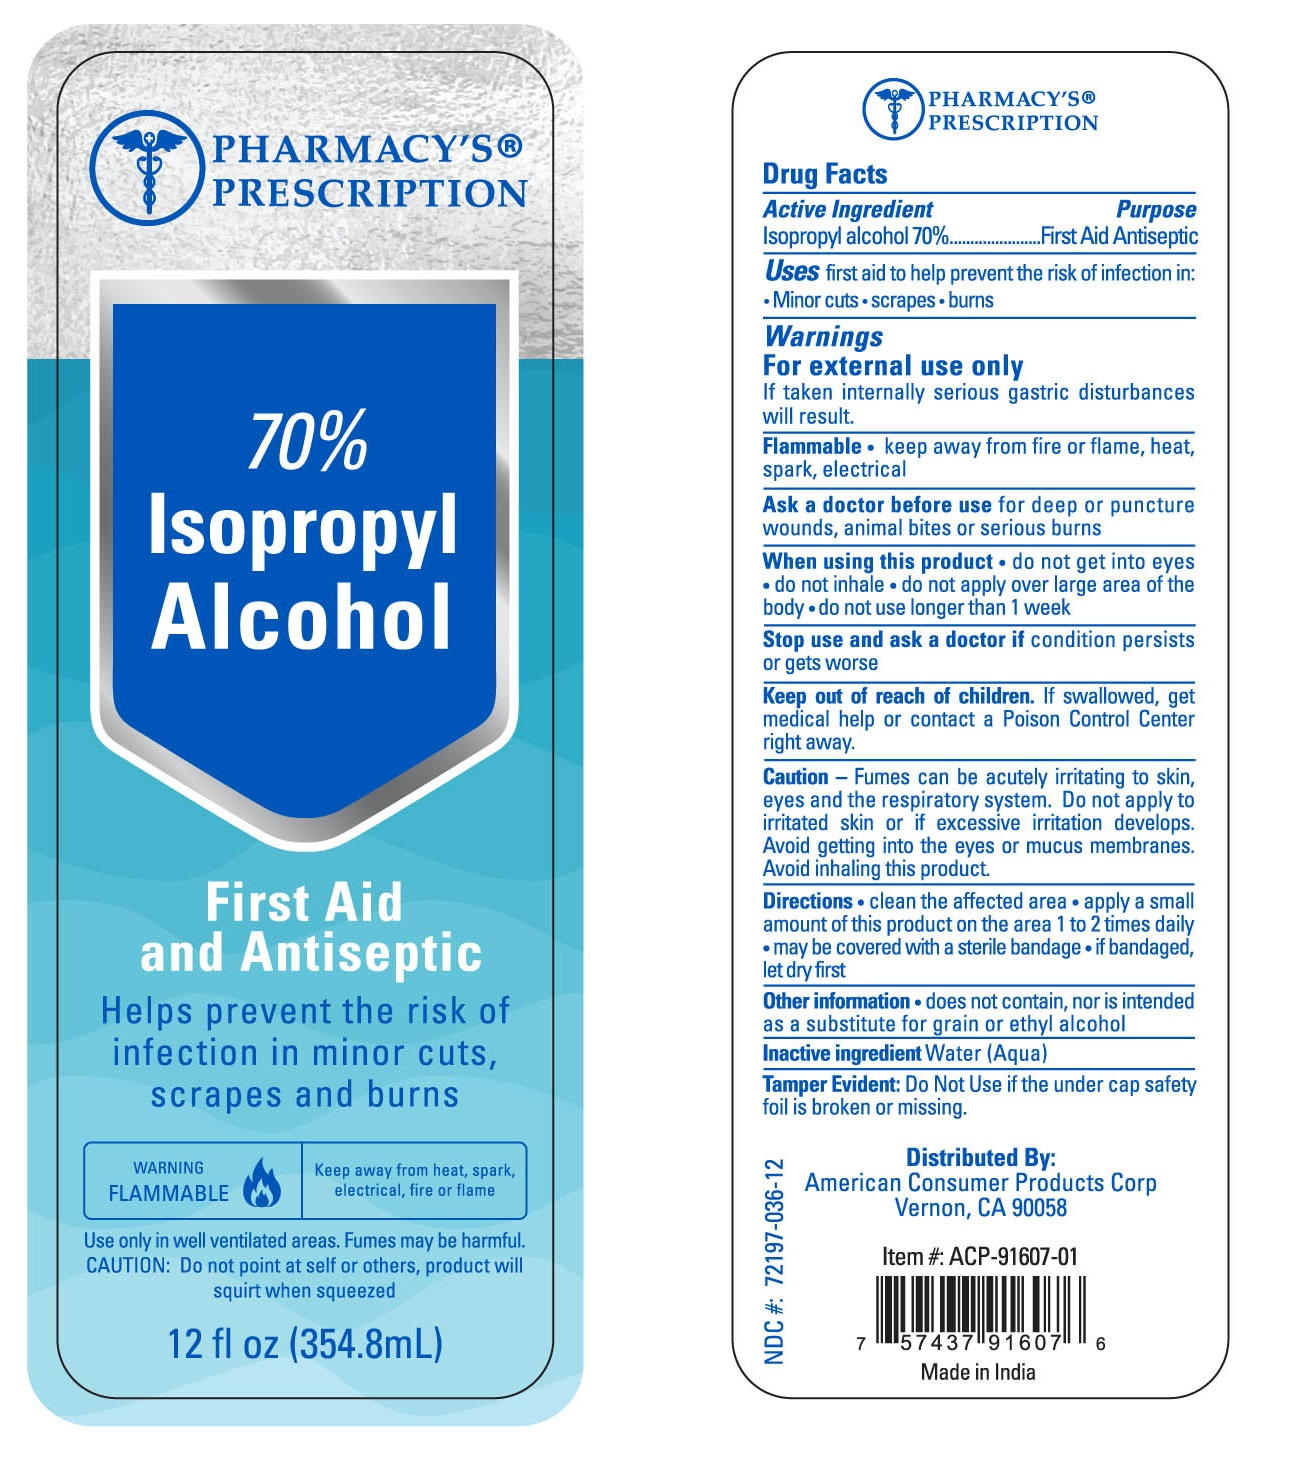 Pharmacys Prescription Isopropyl Alcohol